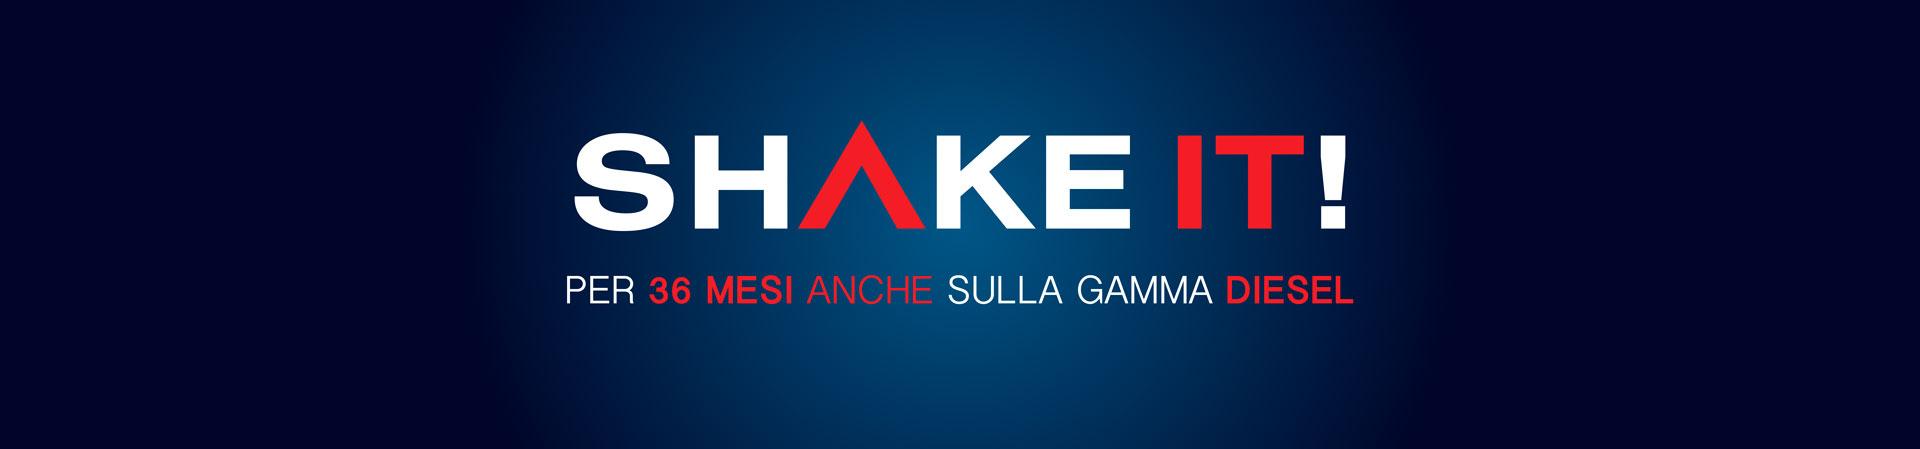 shake it gamma diesel